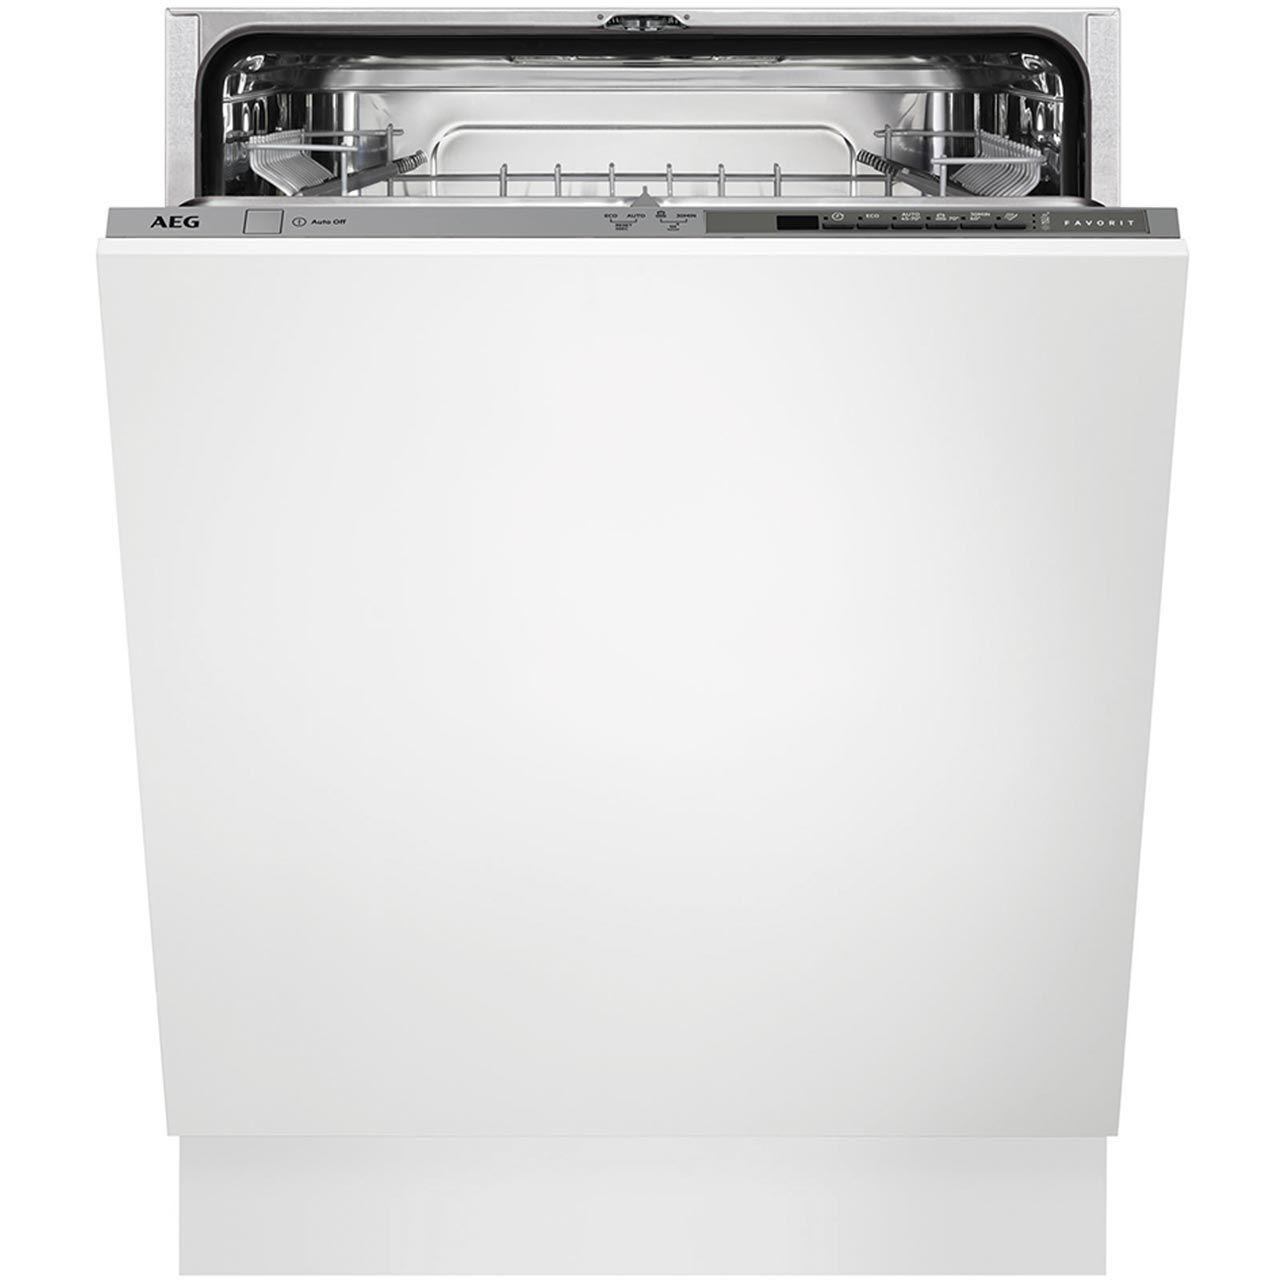 FSB41600Z_SI AEG Dishwasher A+ Air Dry Tech